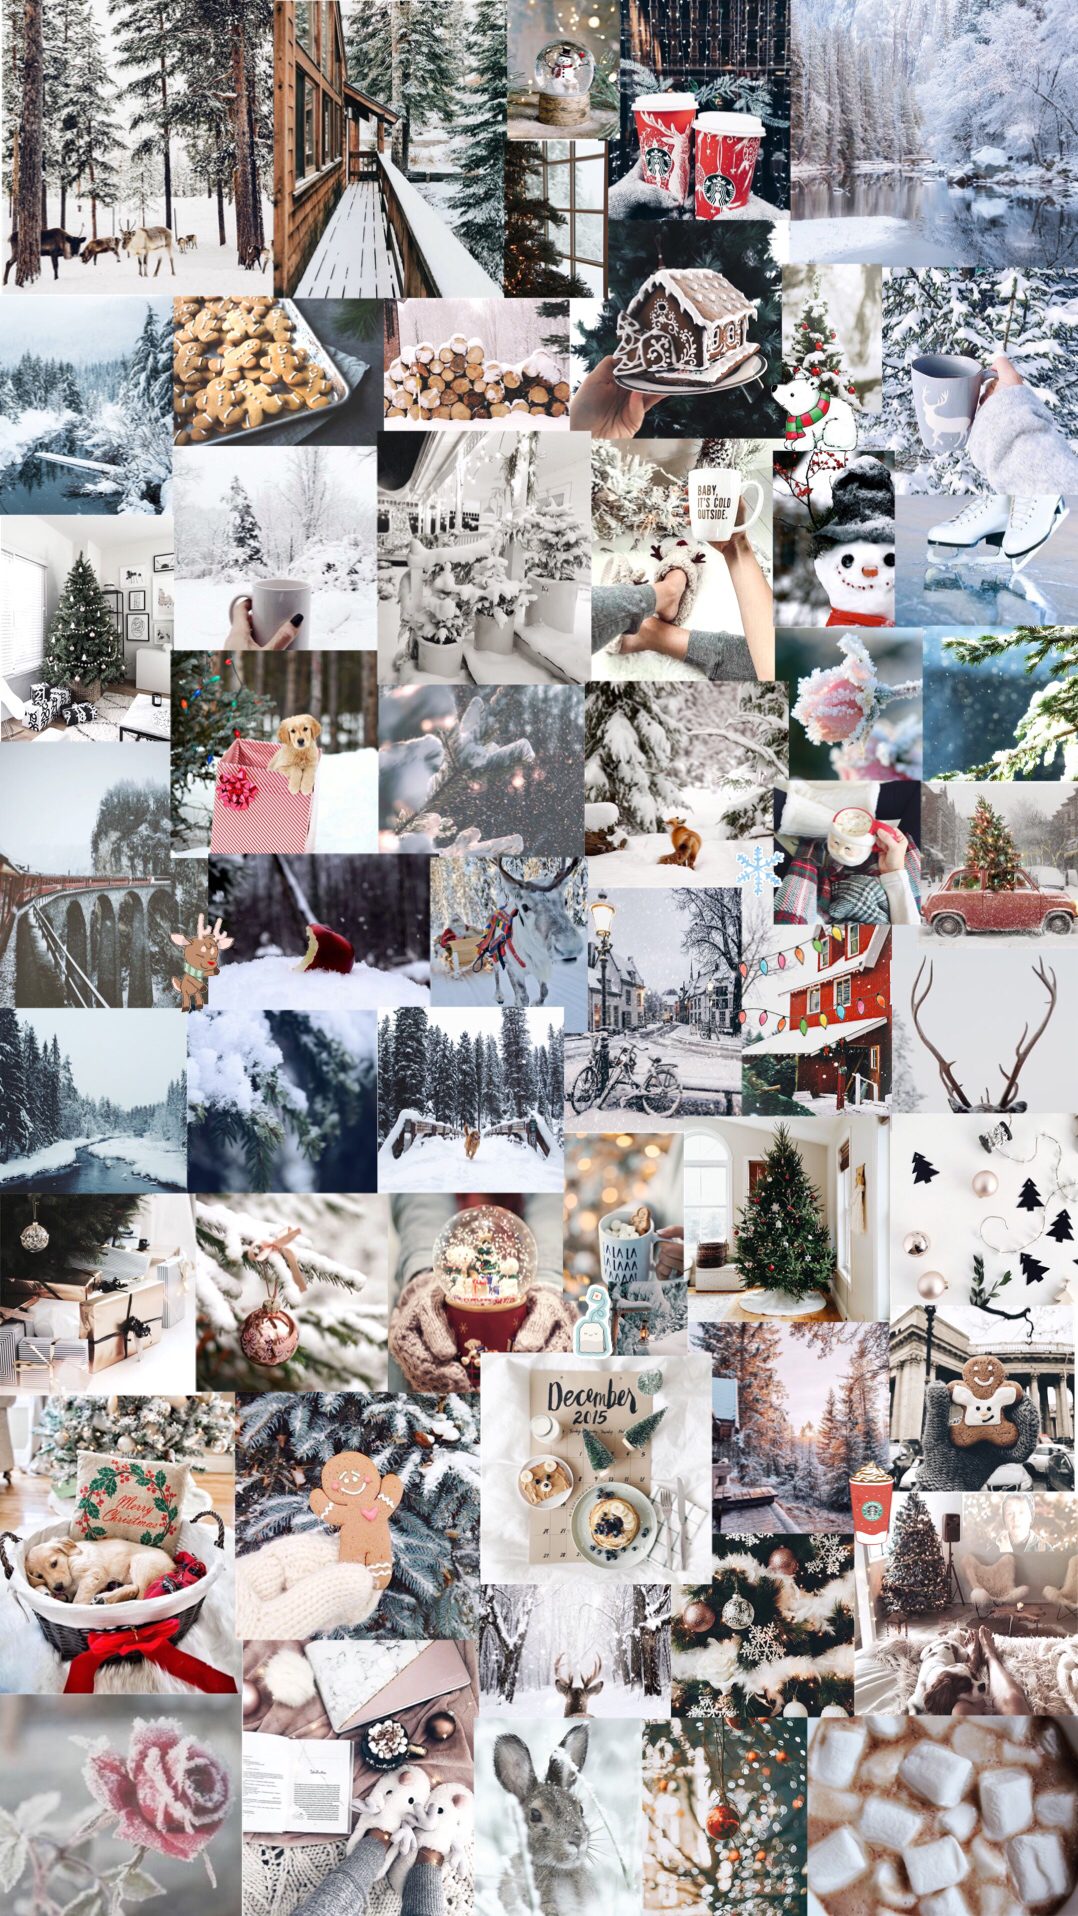 winter aesthetic background Winter wallpaper, Christmas